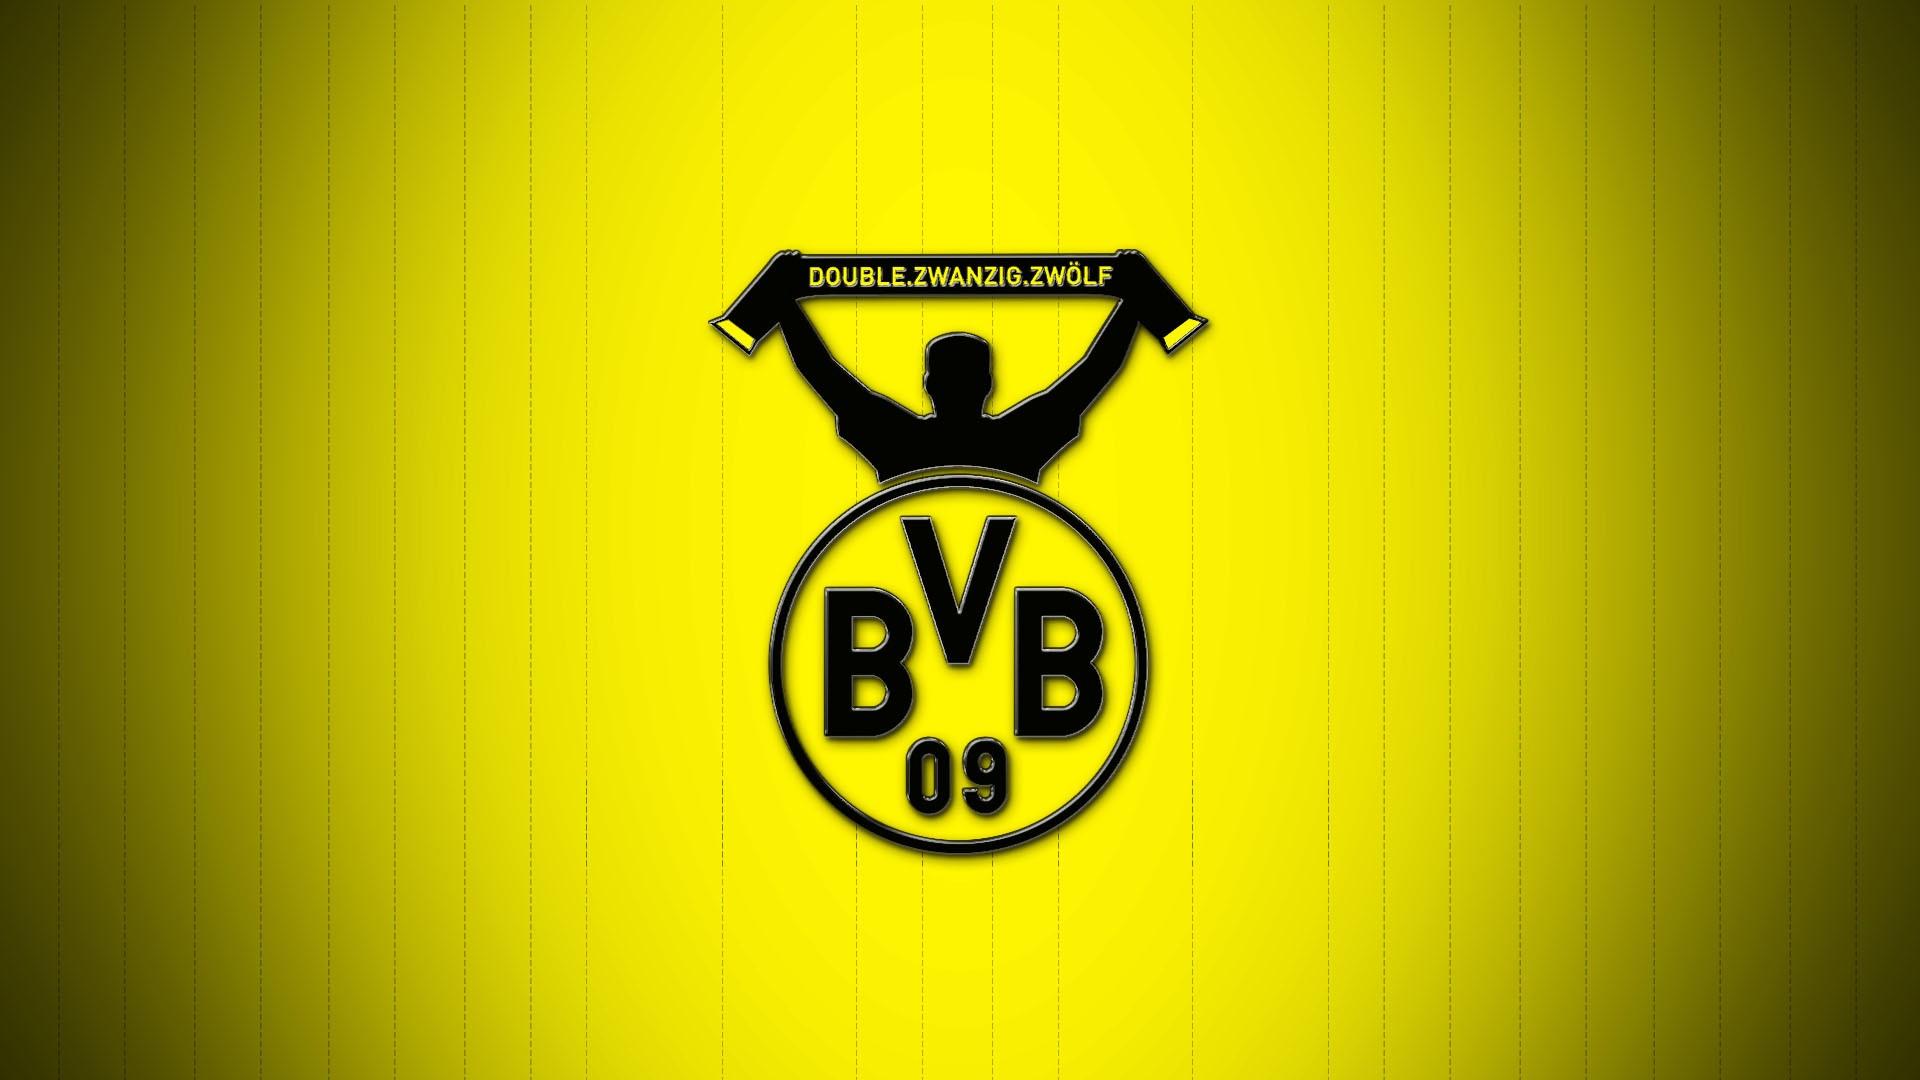 Wallpaper Illustration Text Logo Yellow Brand Bvb Borussia